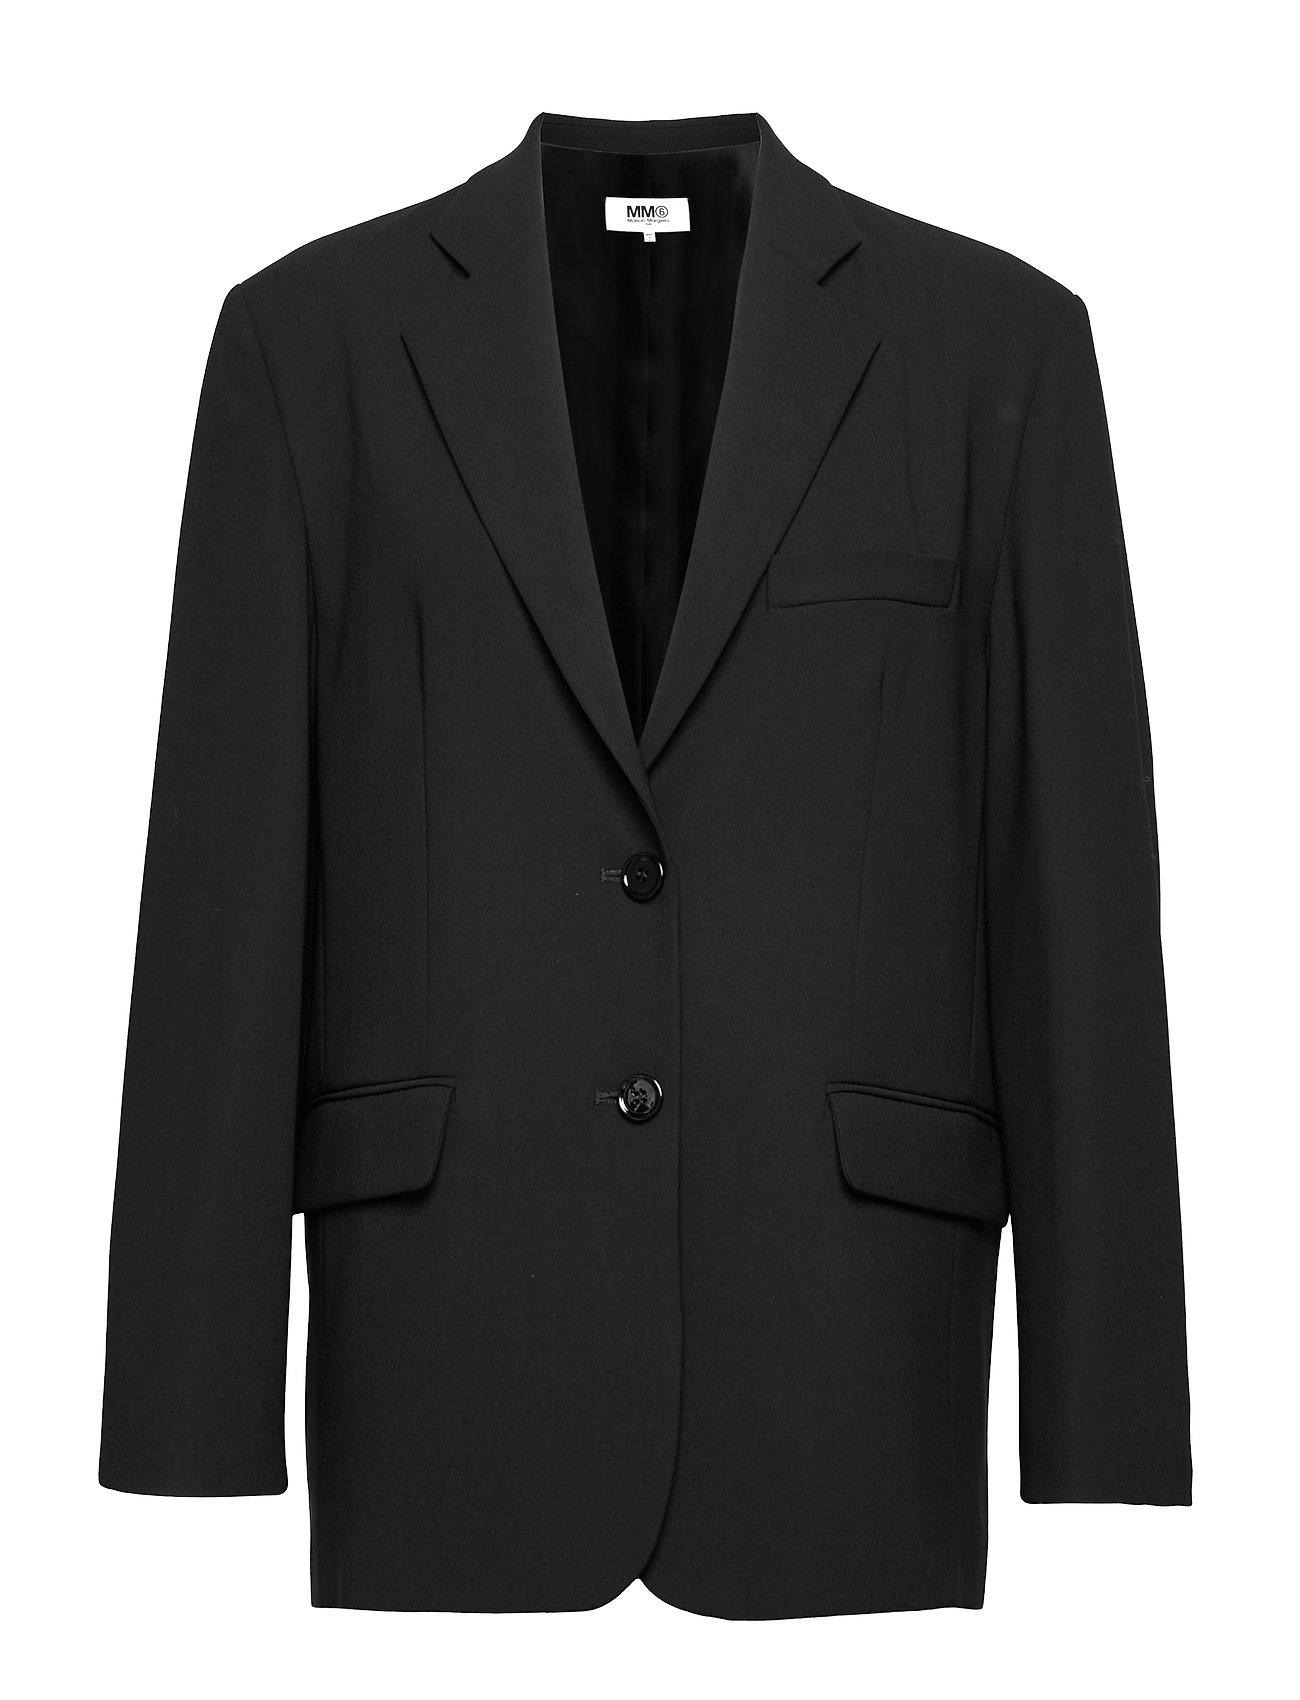 Jacket Blazers Over D Blazers Sort MM6 Maison Margiela